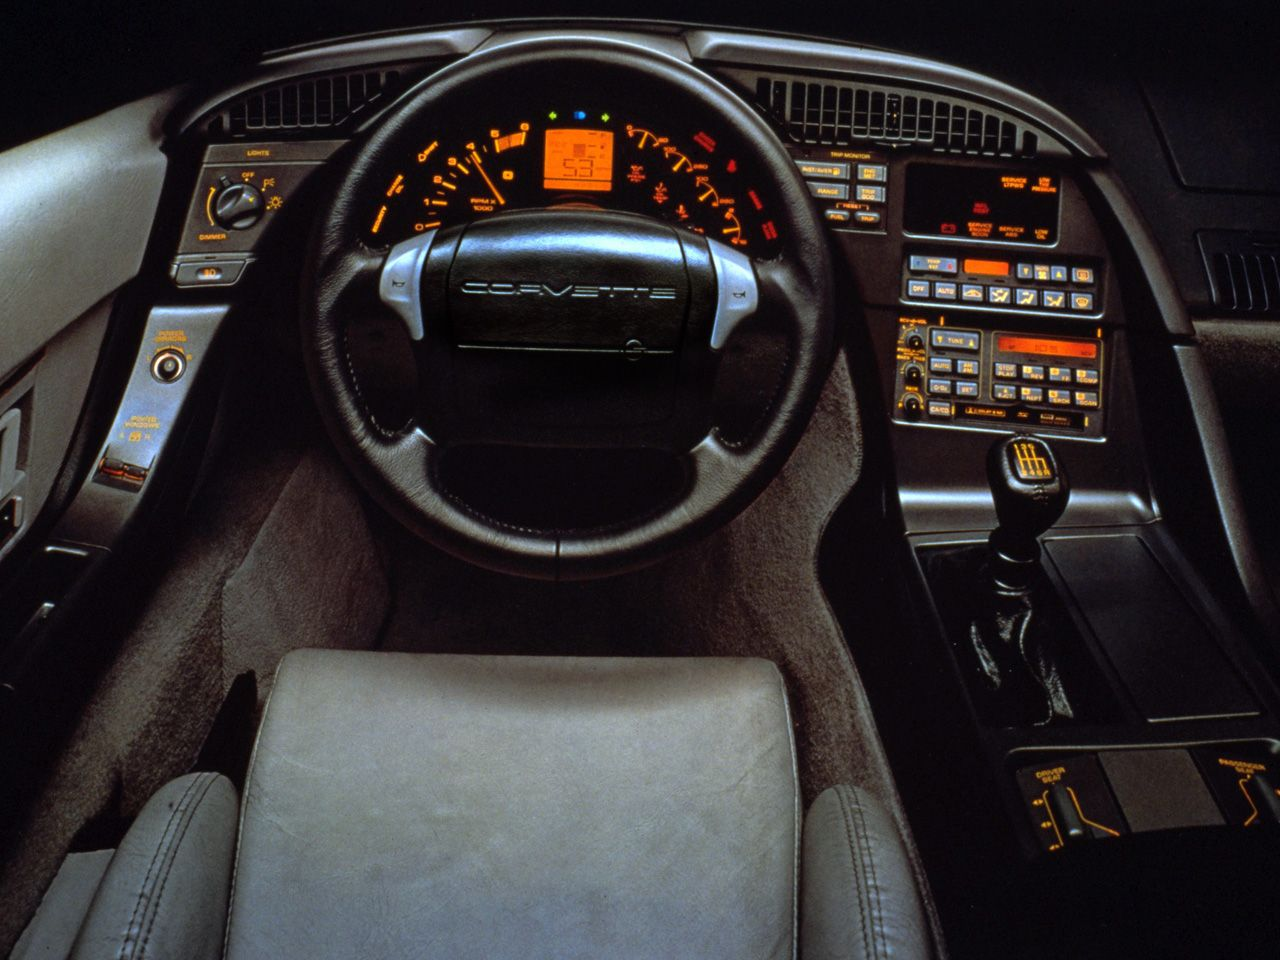 hight resolution of 1995 corvette interior chevrolet corvette c4 manual transmission super sport buick cadillac